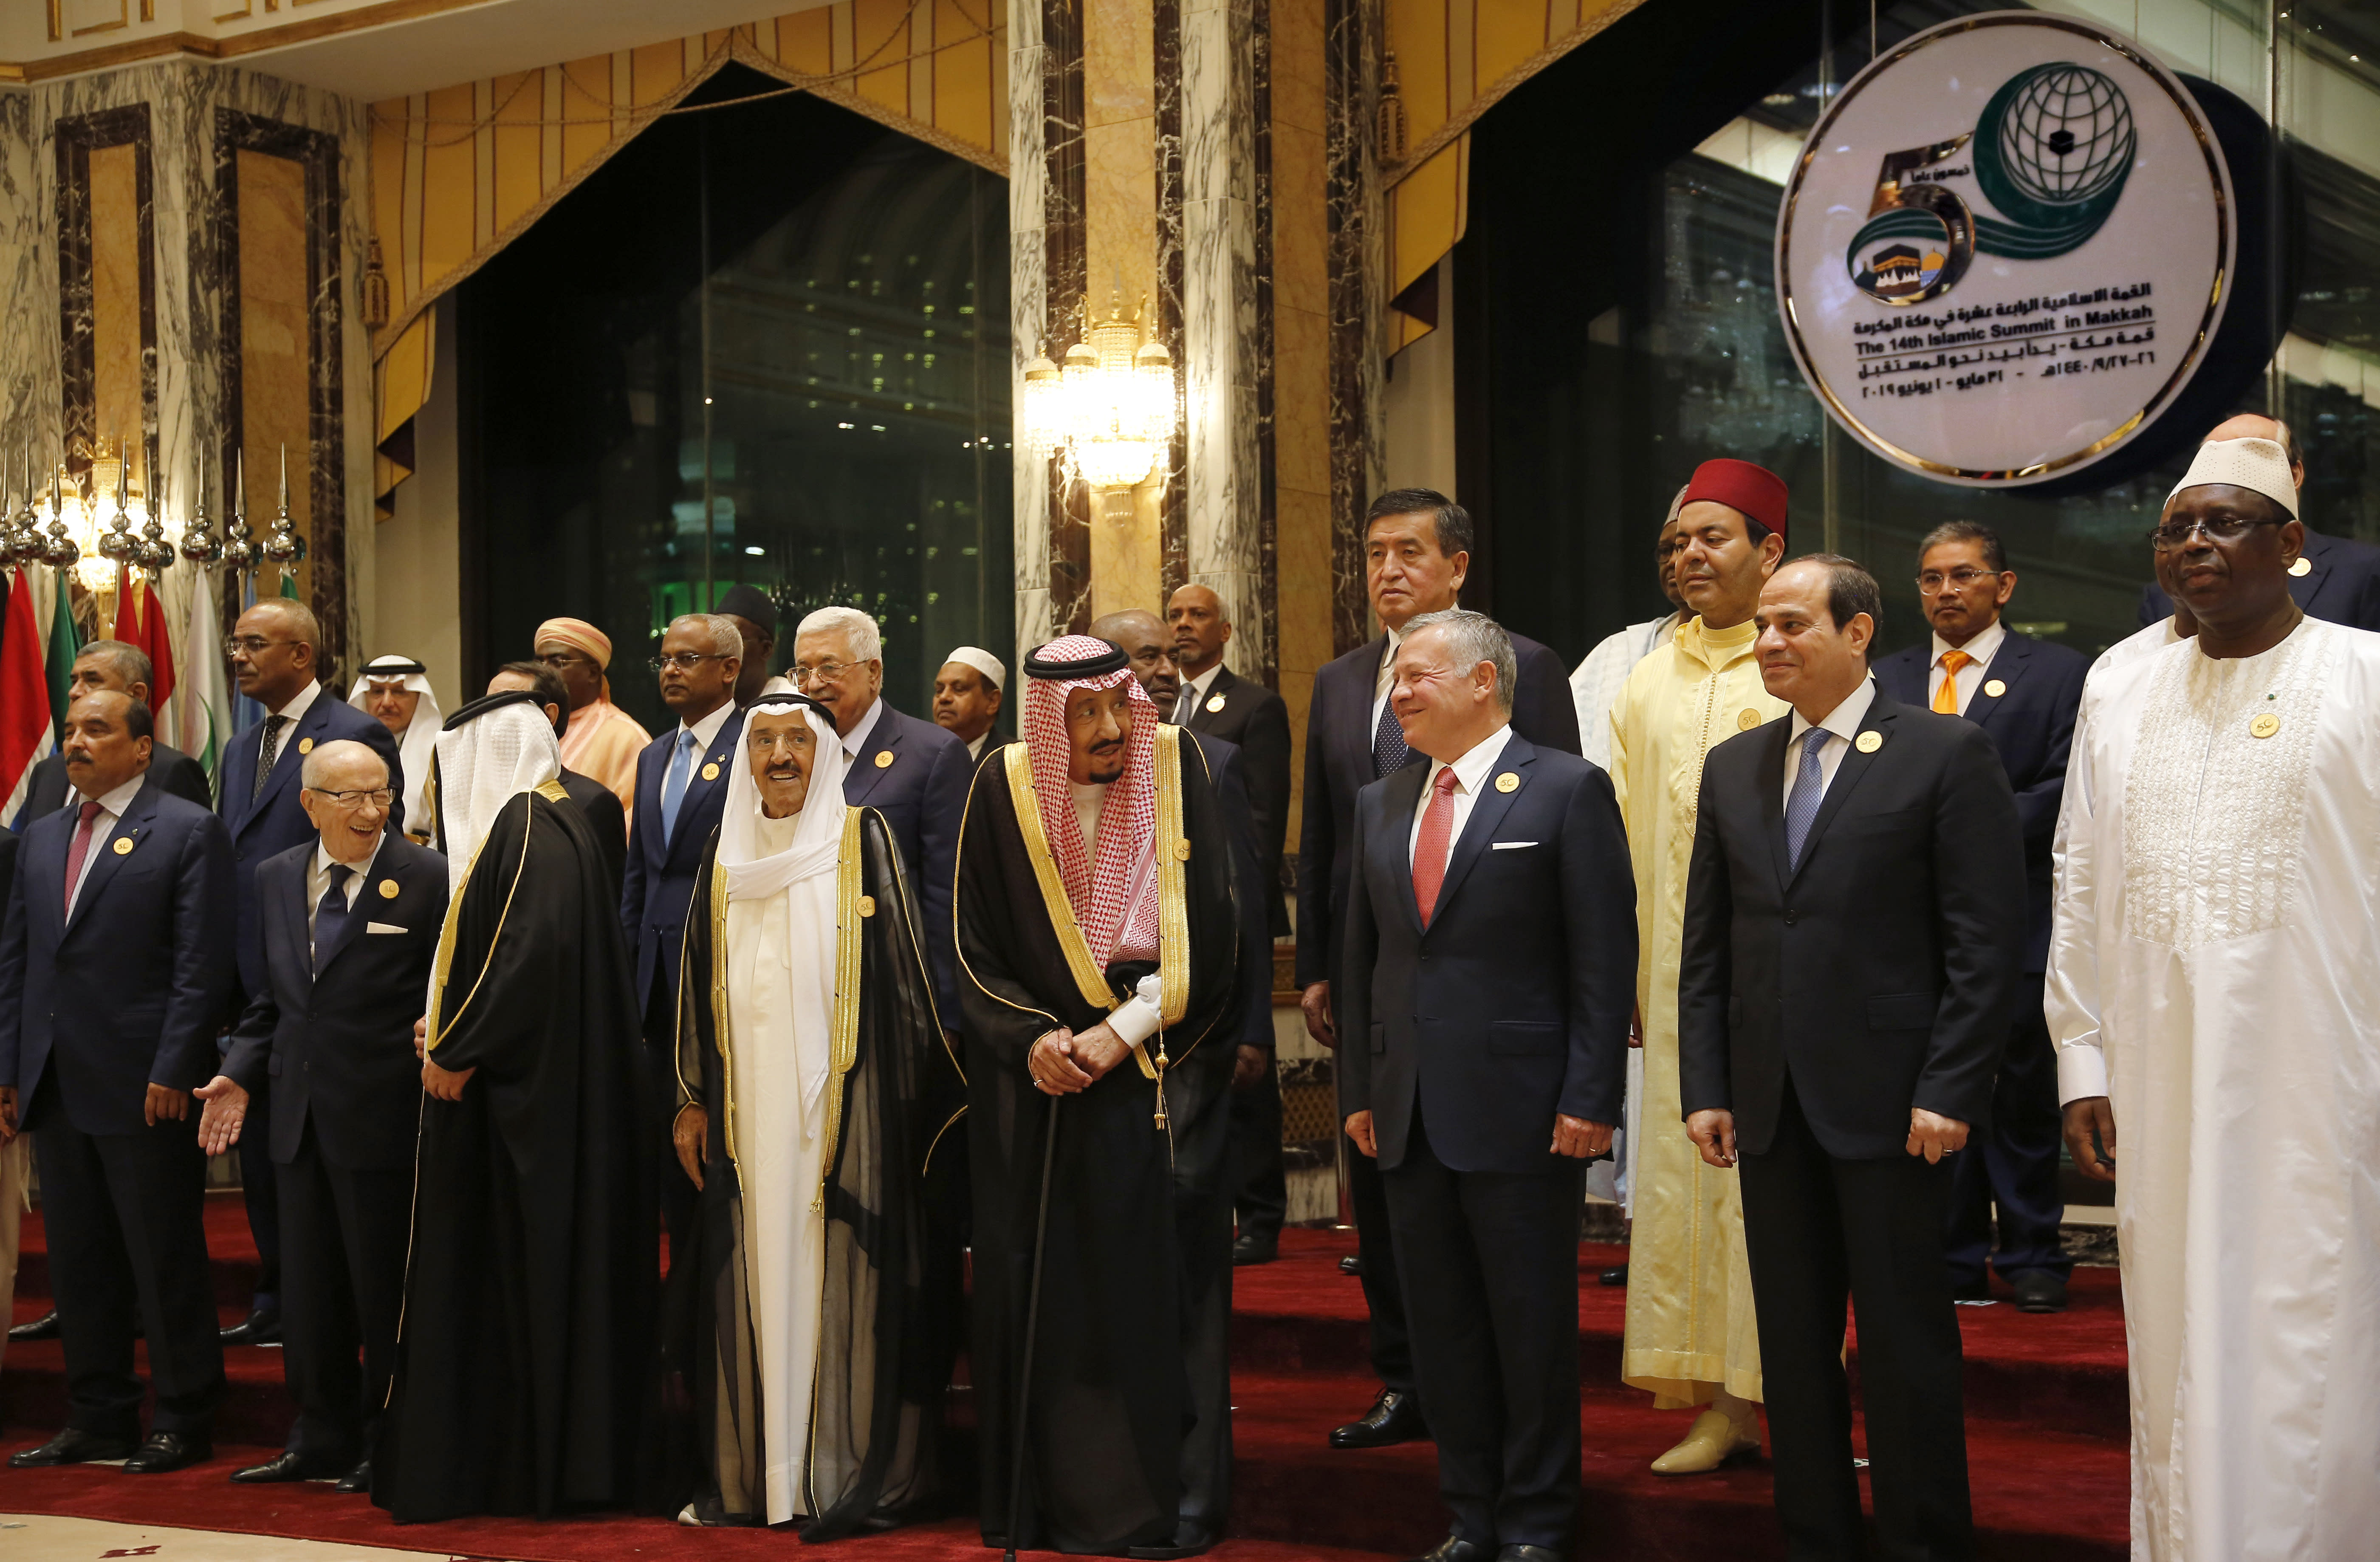 Saudi king slams Iran's 'terrorist acts' at Islamic summit